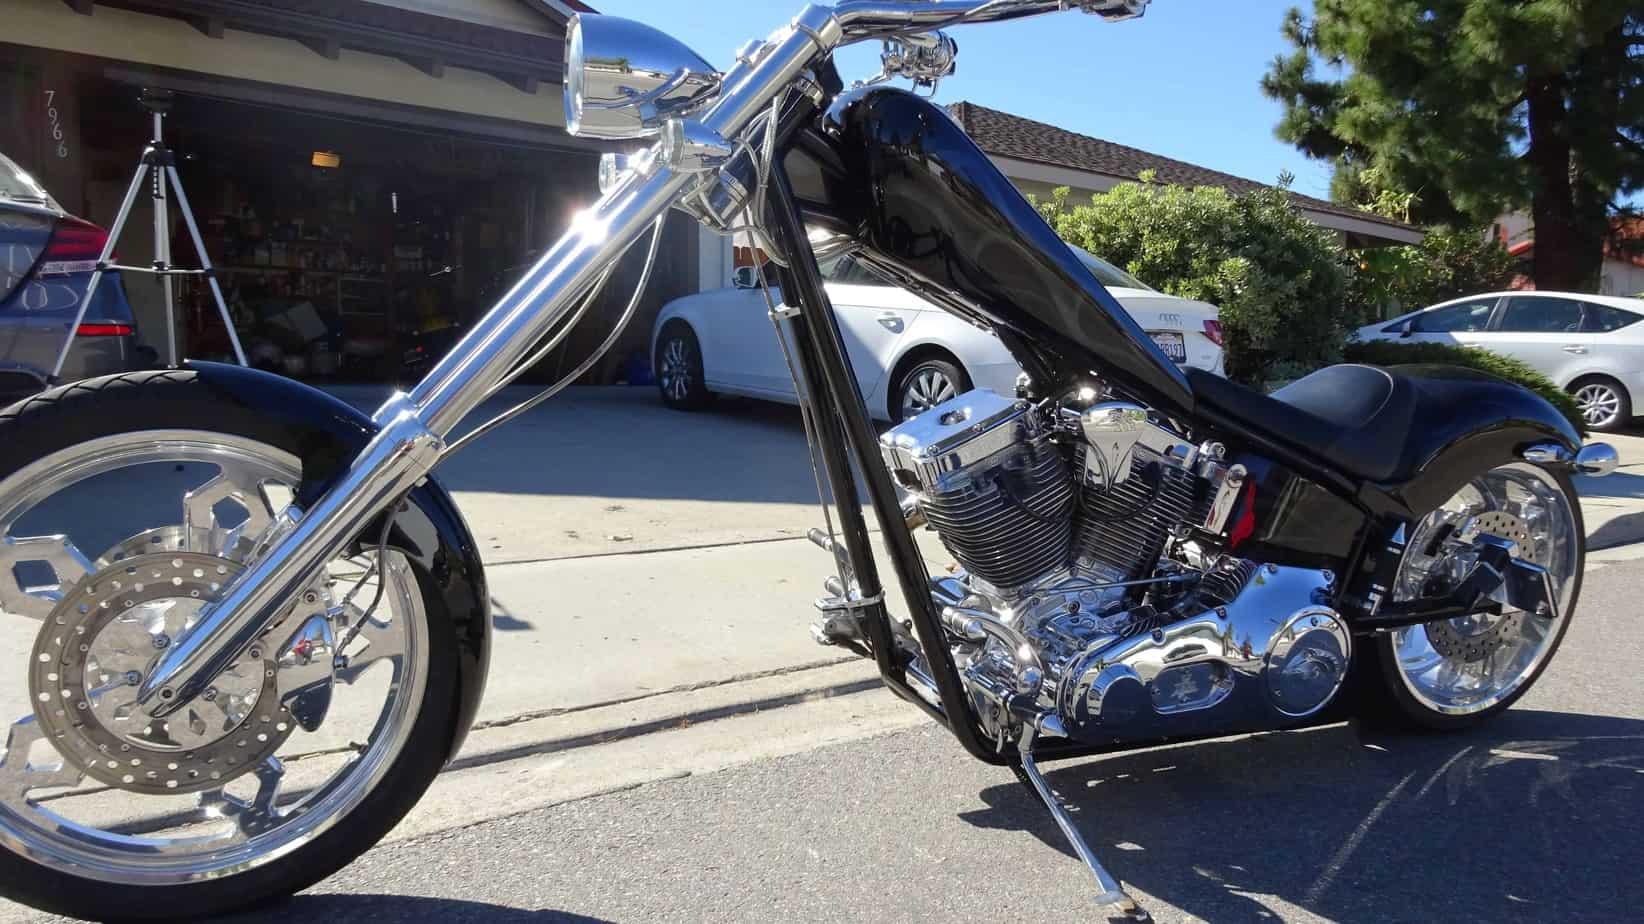 2006 texas chopper for sale san diego custom motorcycles san diego custom motorcycles. Black Bedroom Furniture Sets. Home Design Ideas